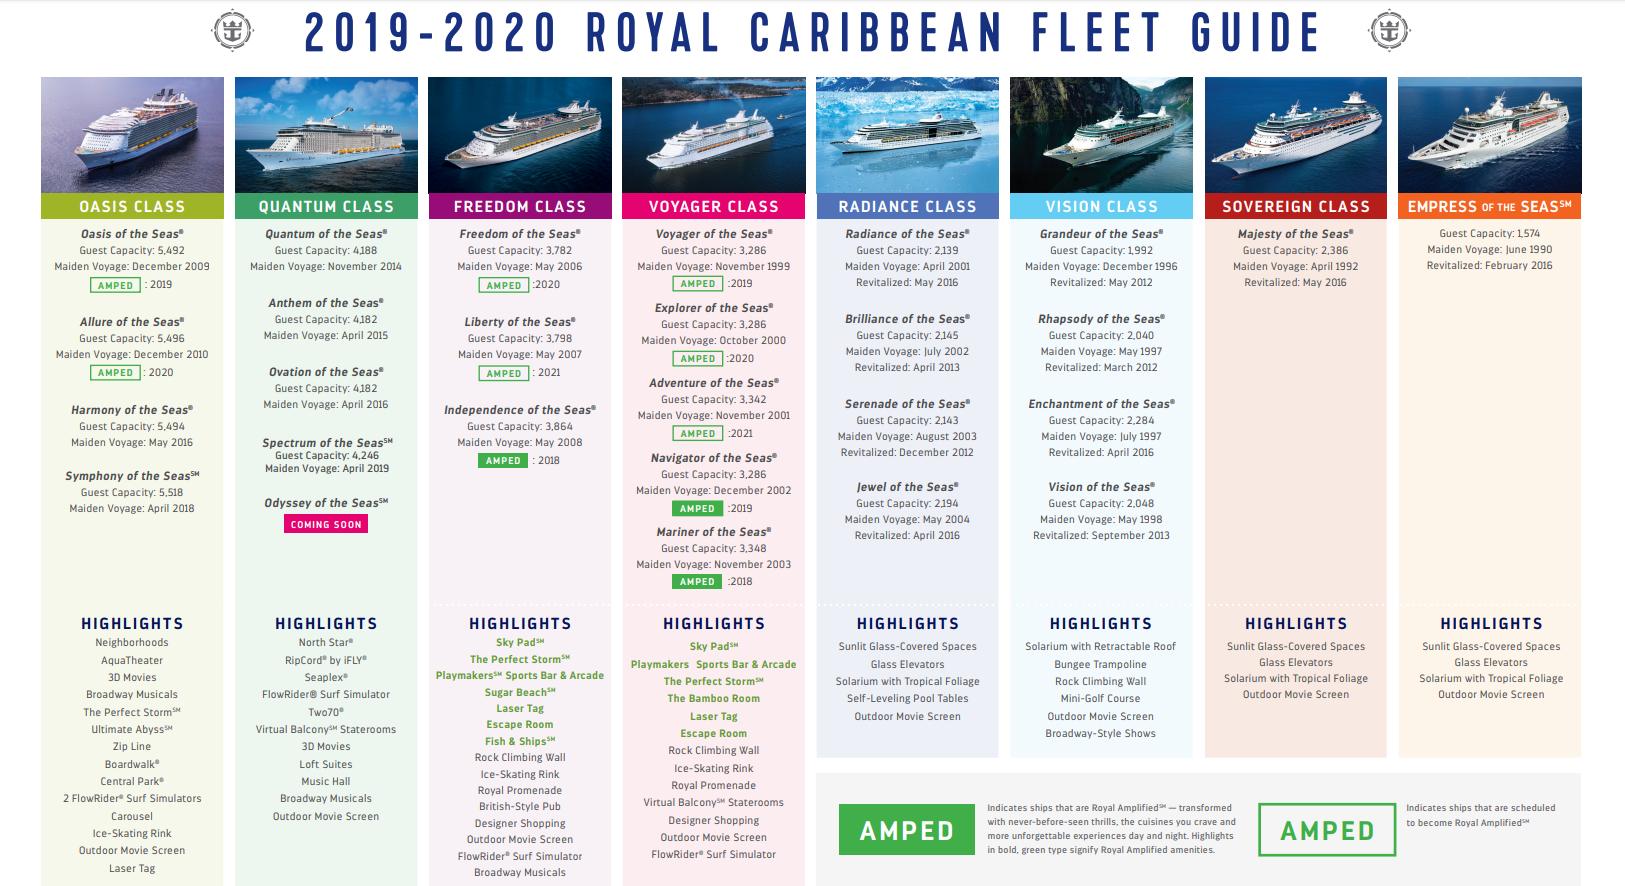 Fleet guide - Royal Caribbean Discussion - Royal Caribbean Blog